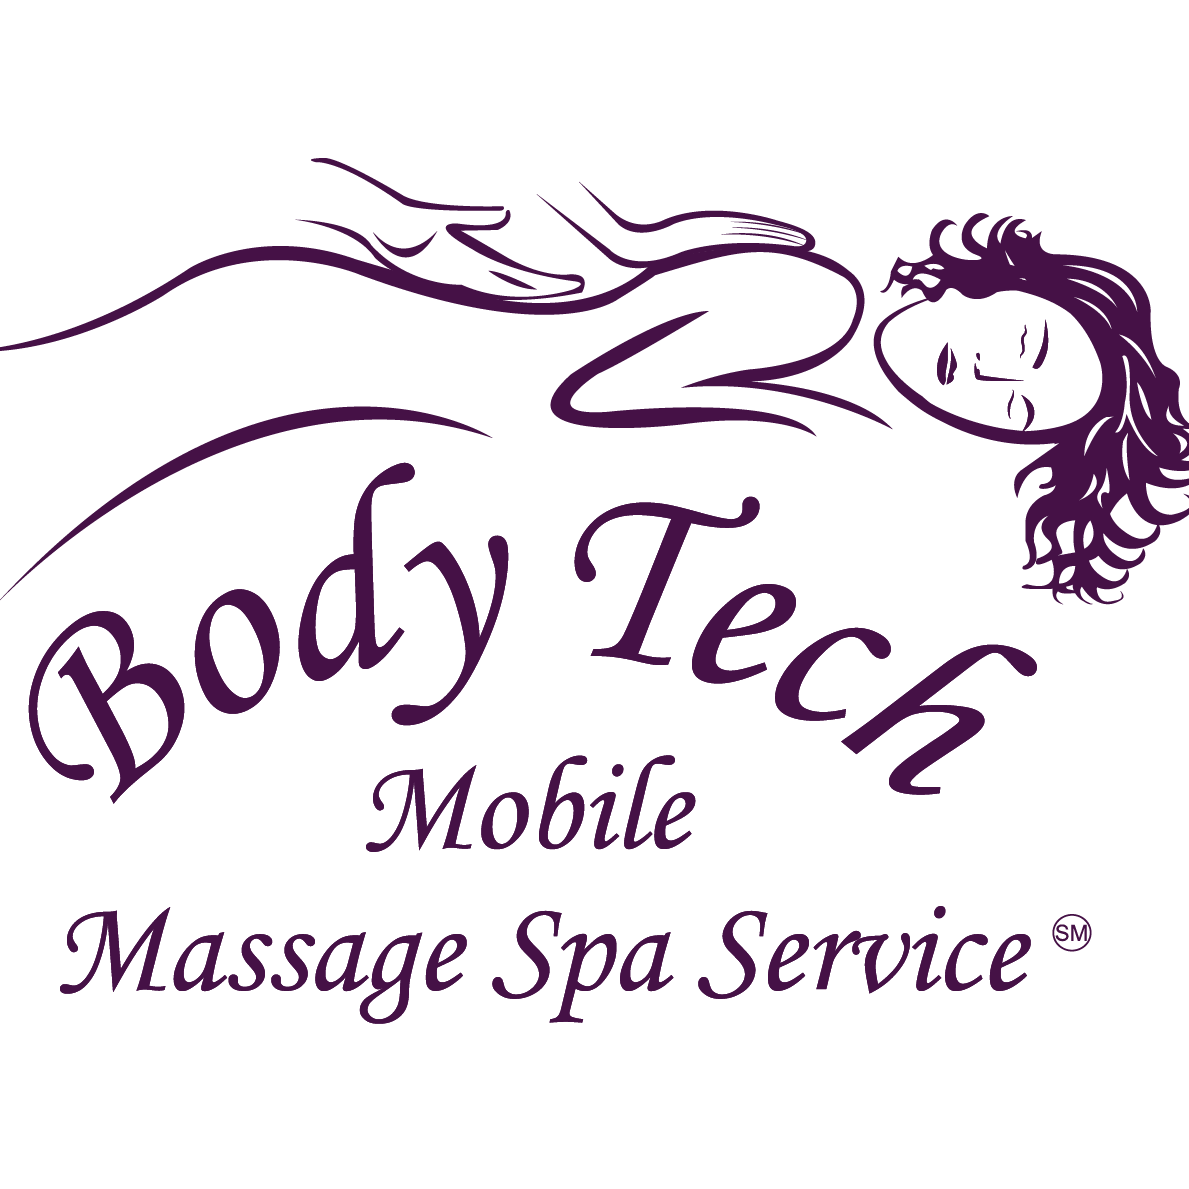 Body Tech Mobile Massage Spa Services